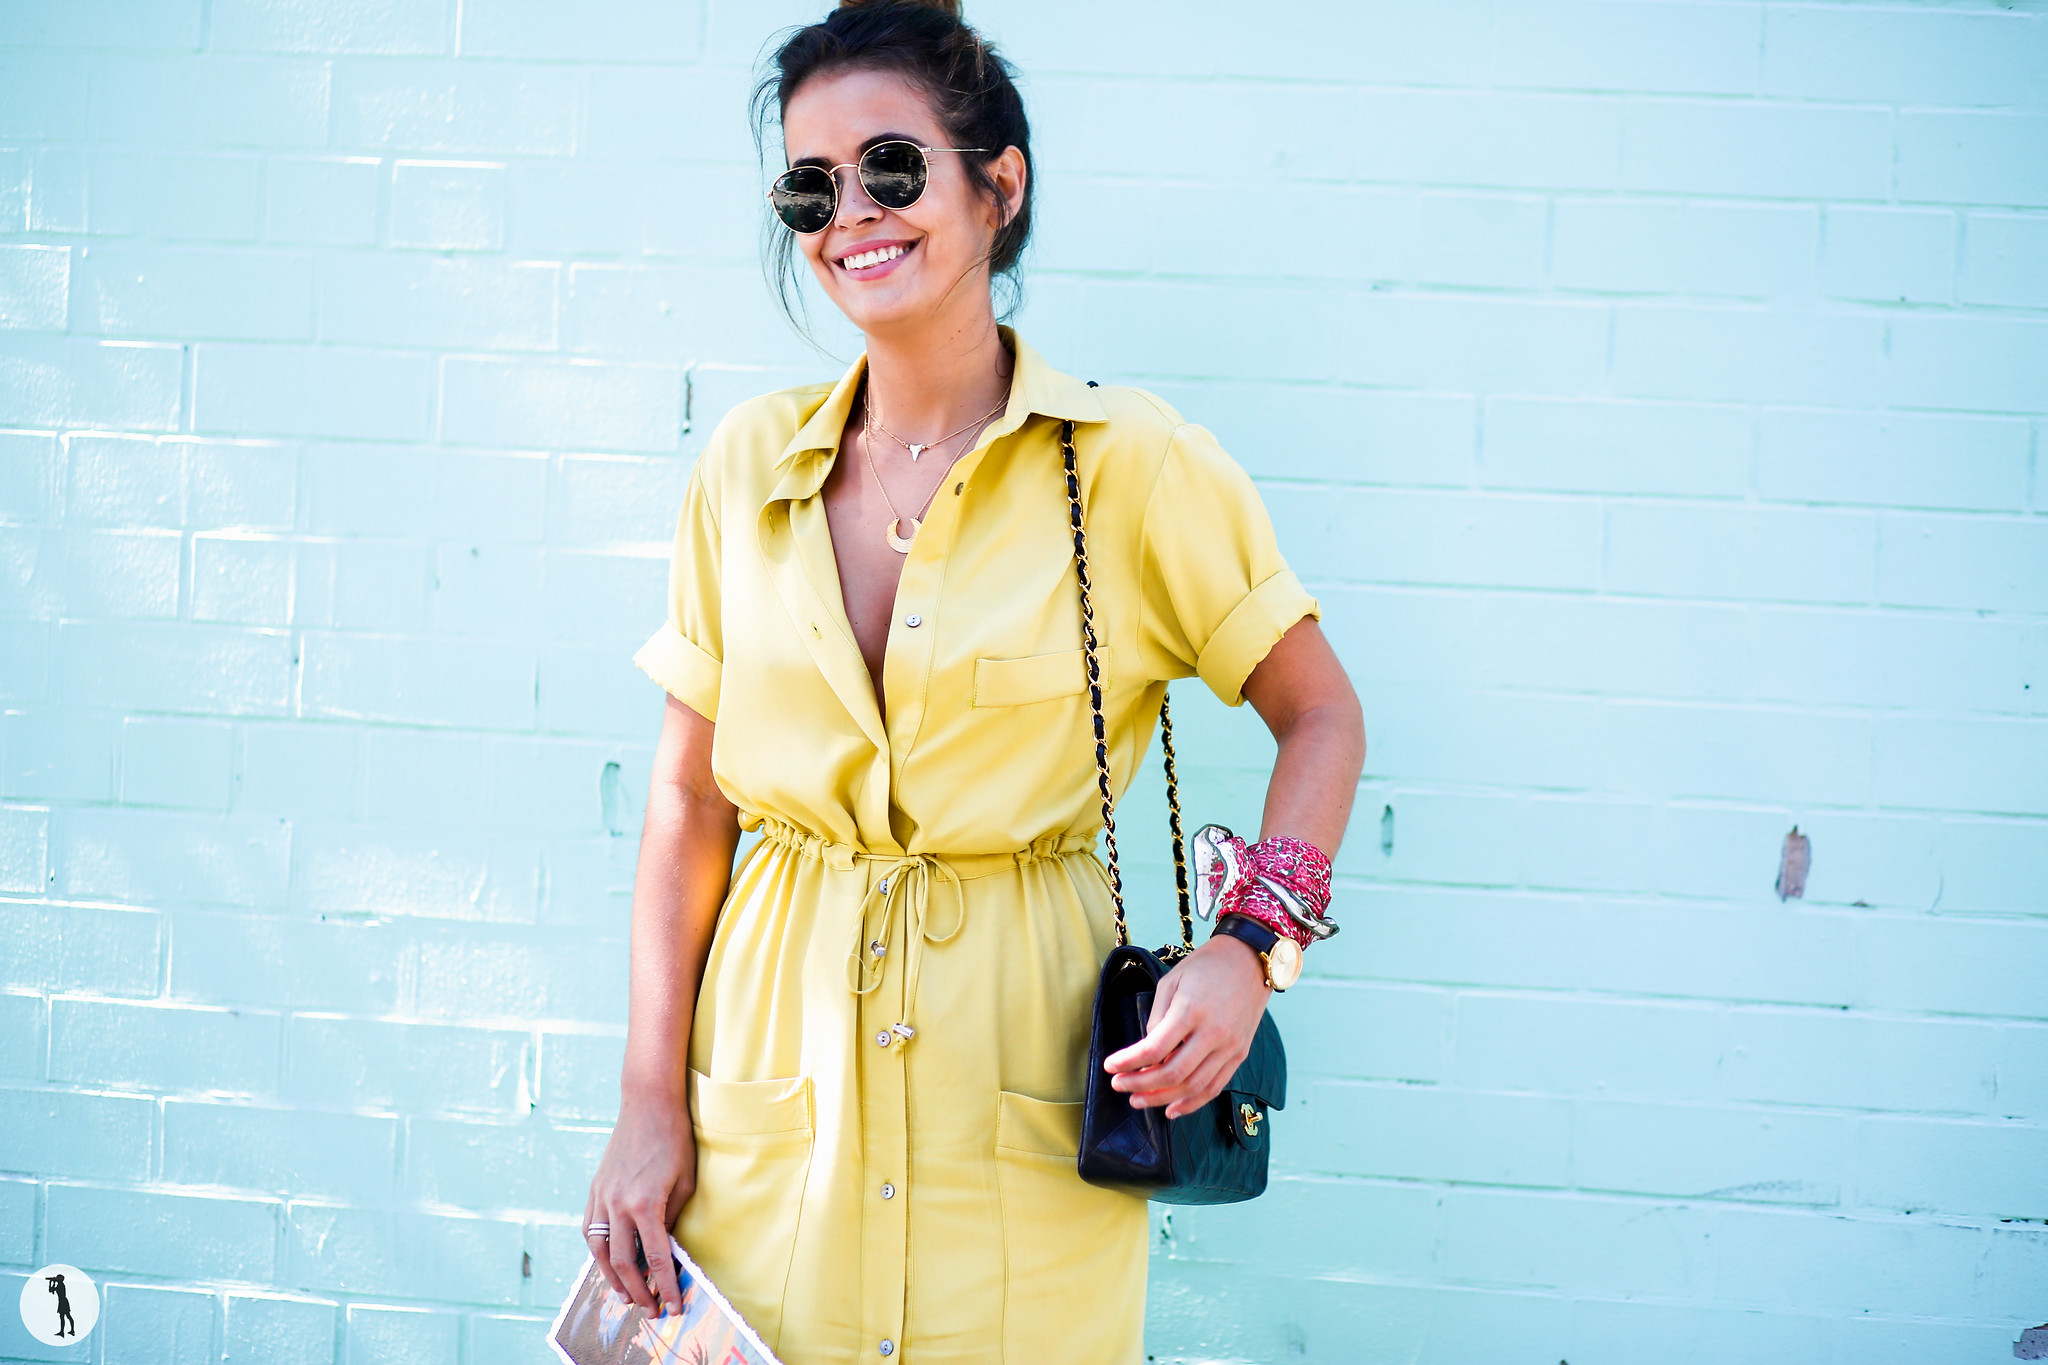 Sara Escudero at New York Fashion Week 2